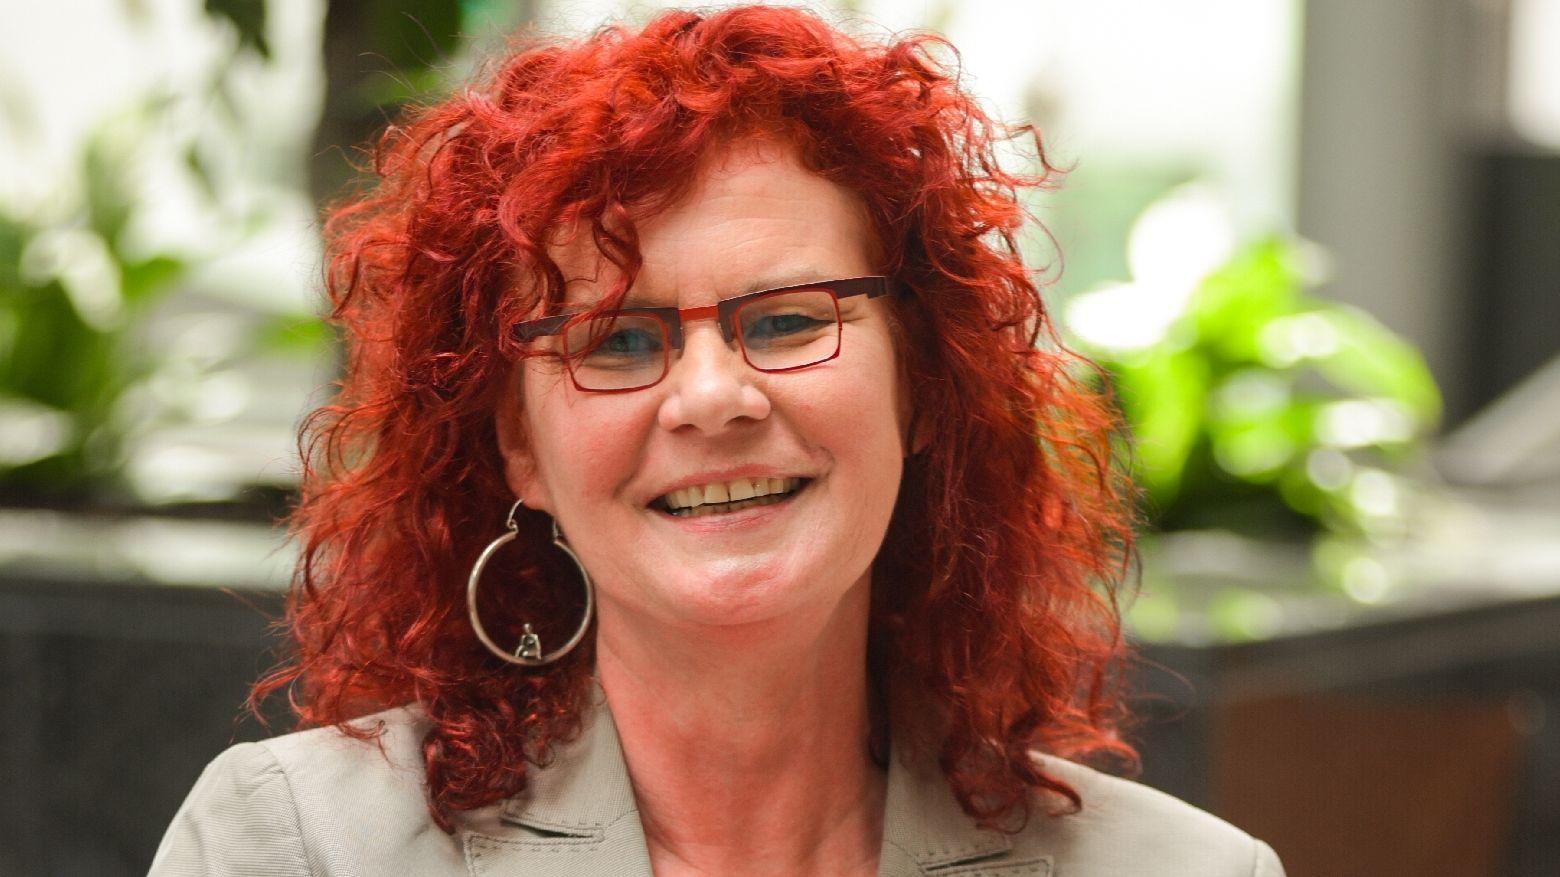 Kerstin Westphal